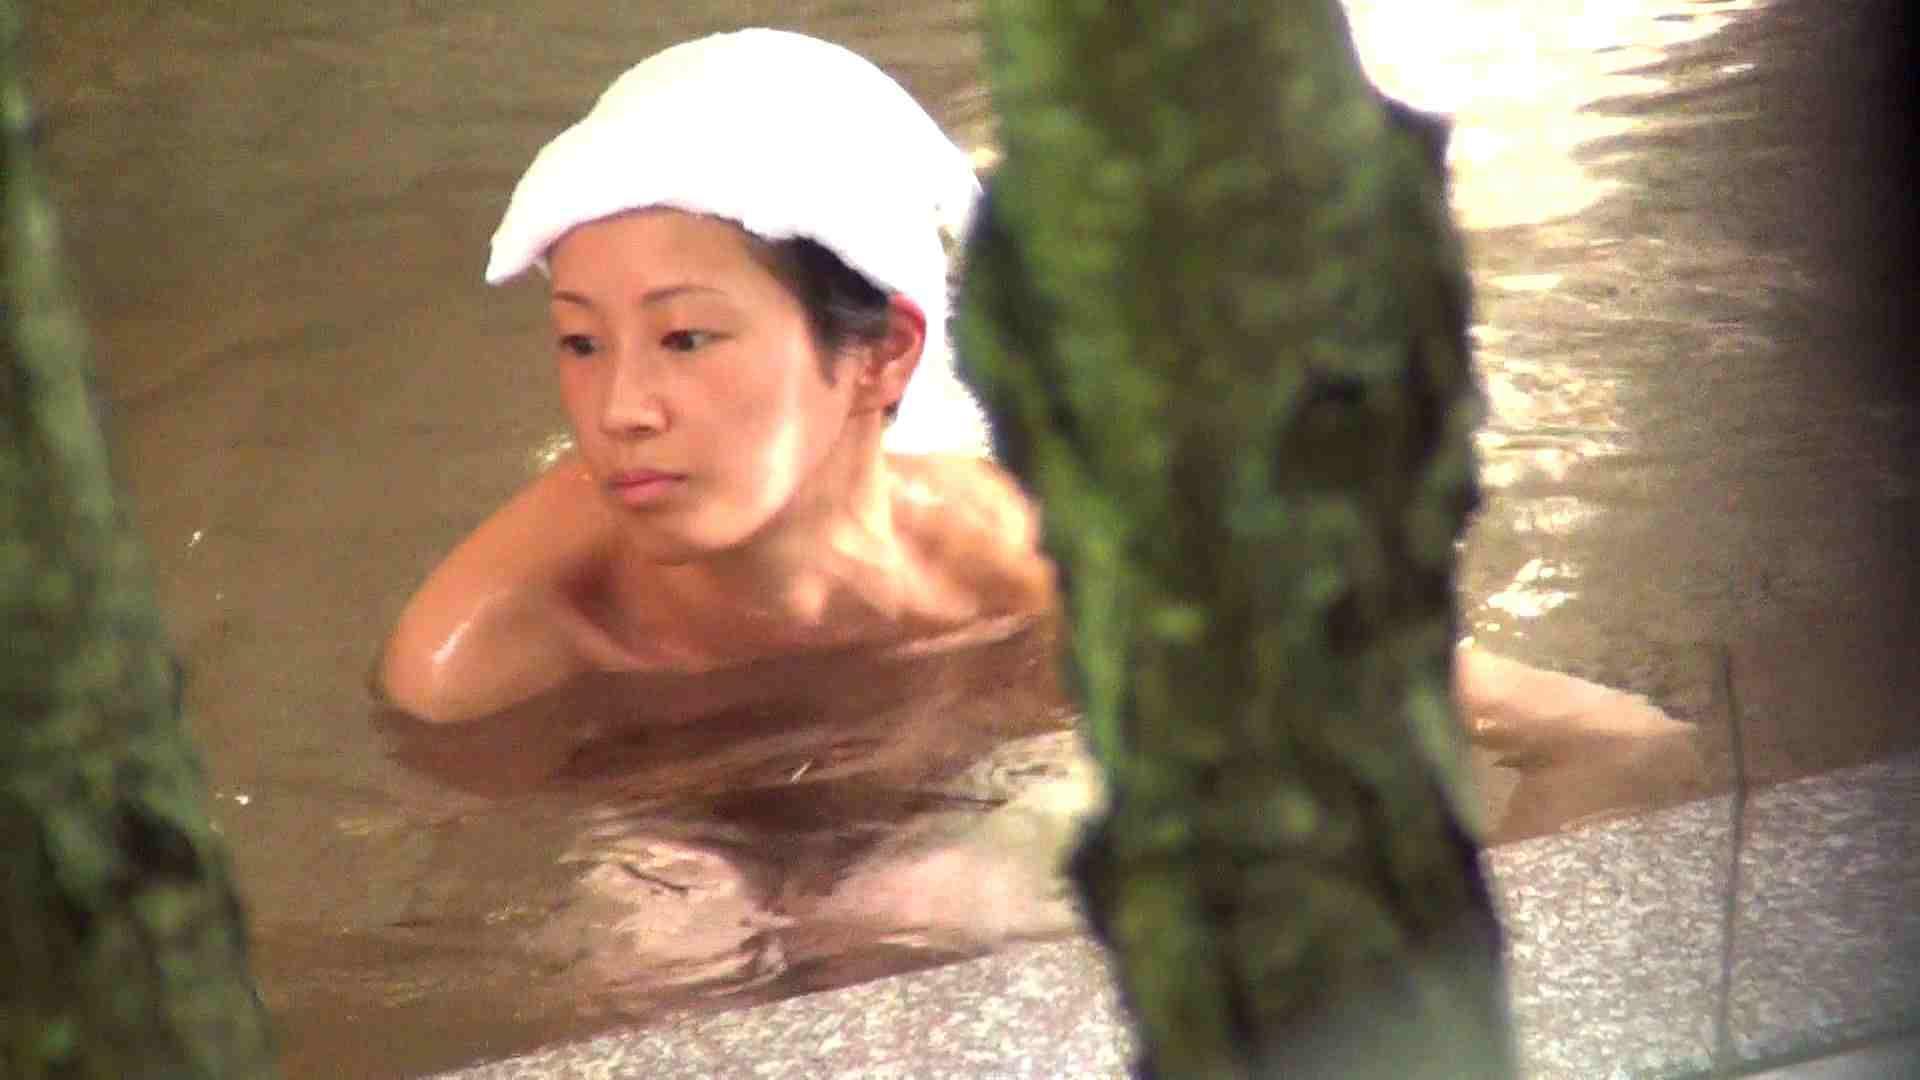 Aquaな露天風呂Vol.281 盗撮大放出 ぱこり動画紹介 60連発 53